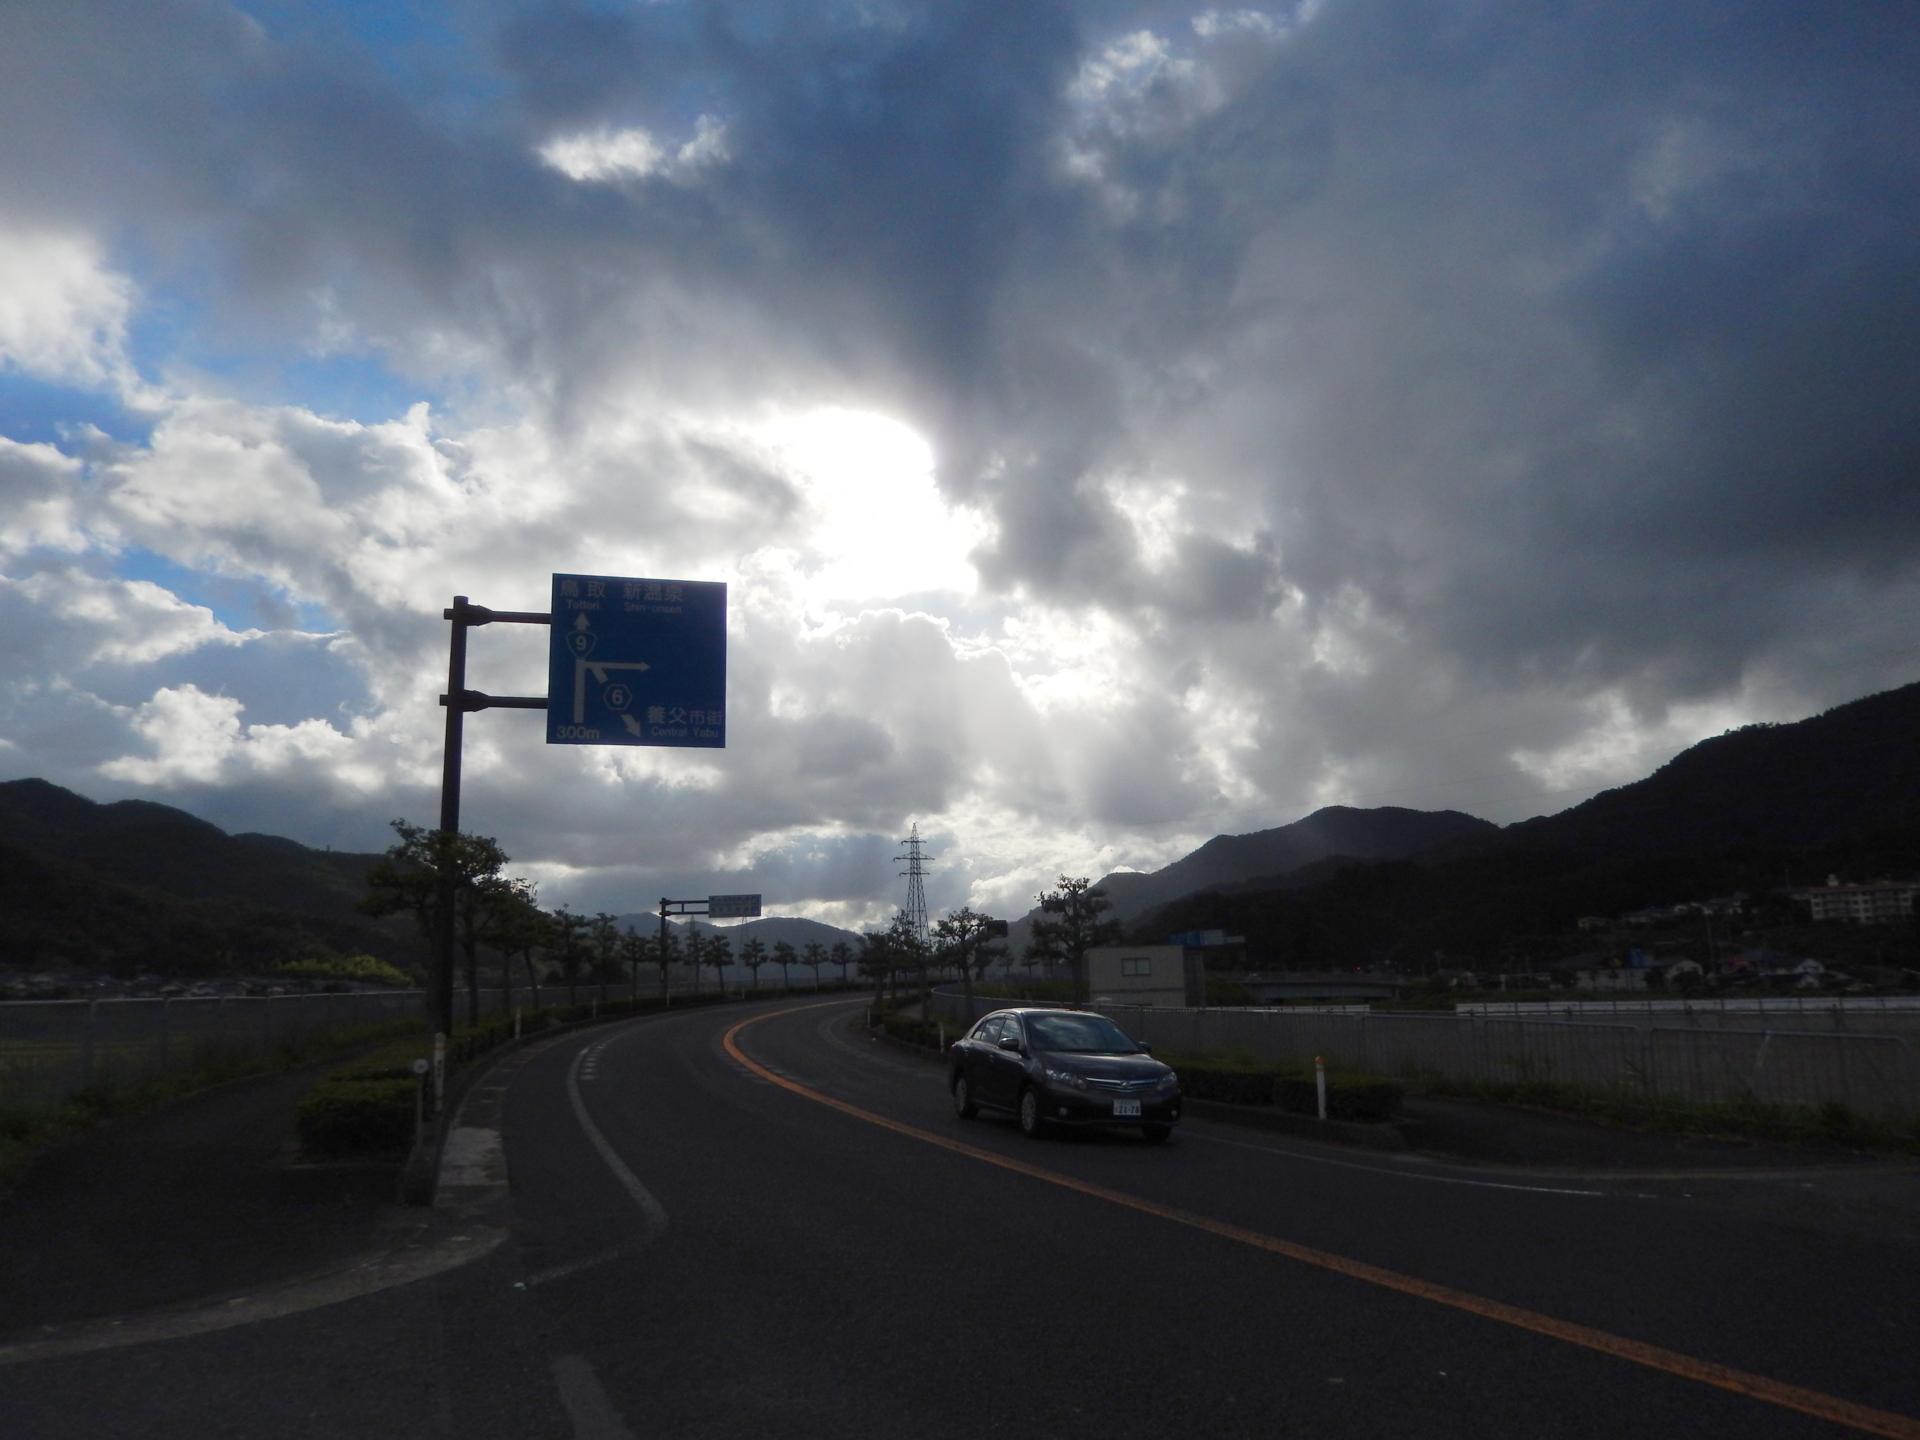 f:id:ToshUeno:20140913162019j:plain